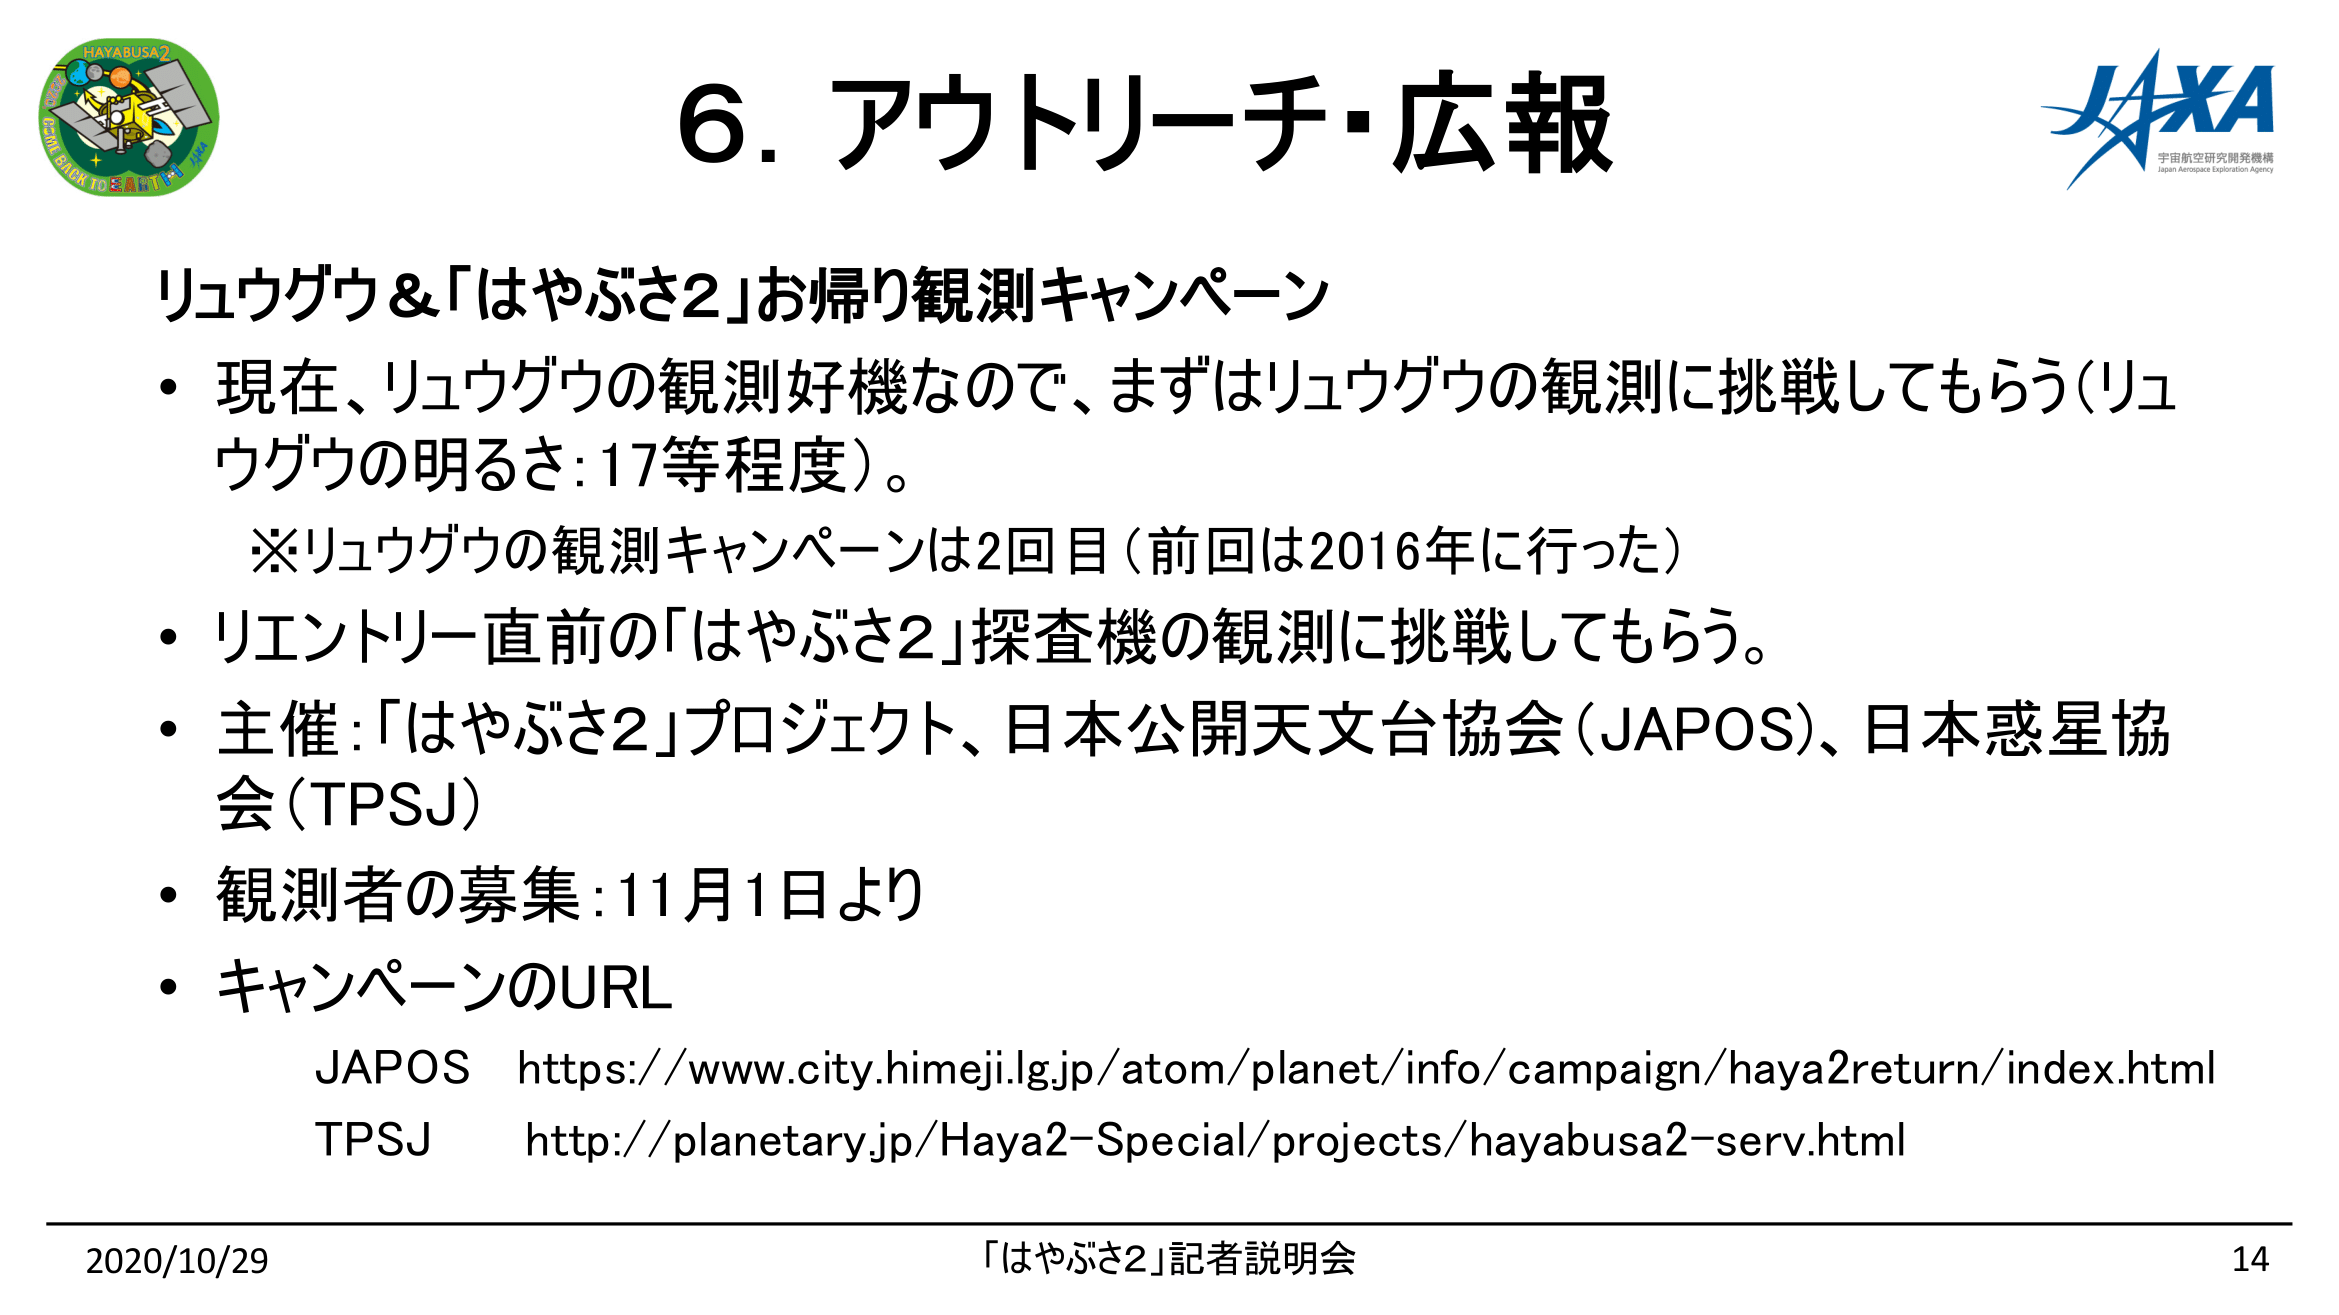 f:id:Imamura:20201029161407p:plain